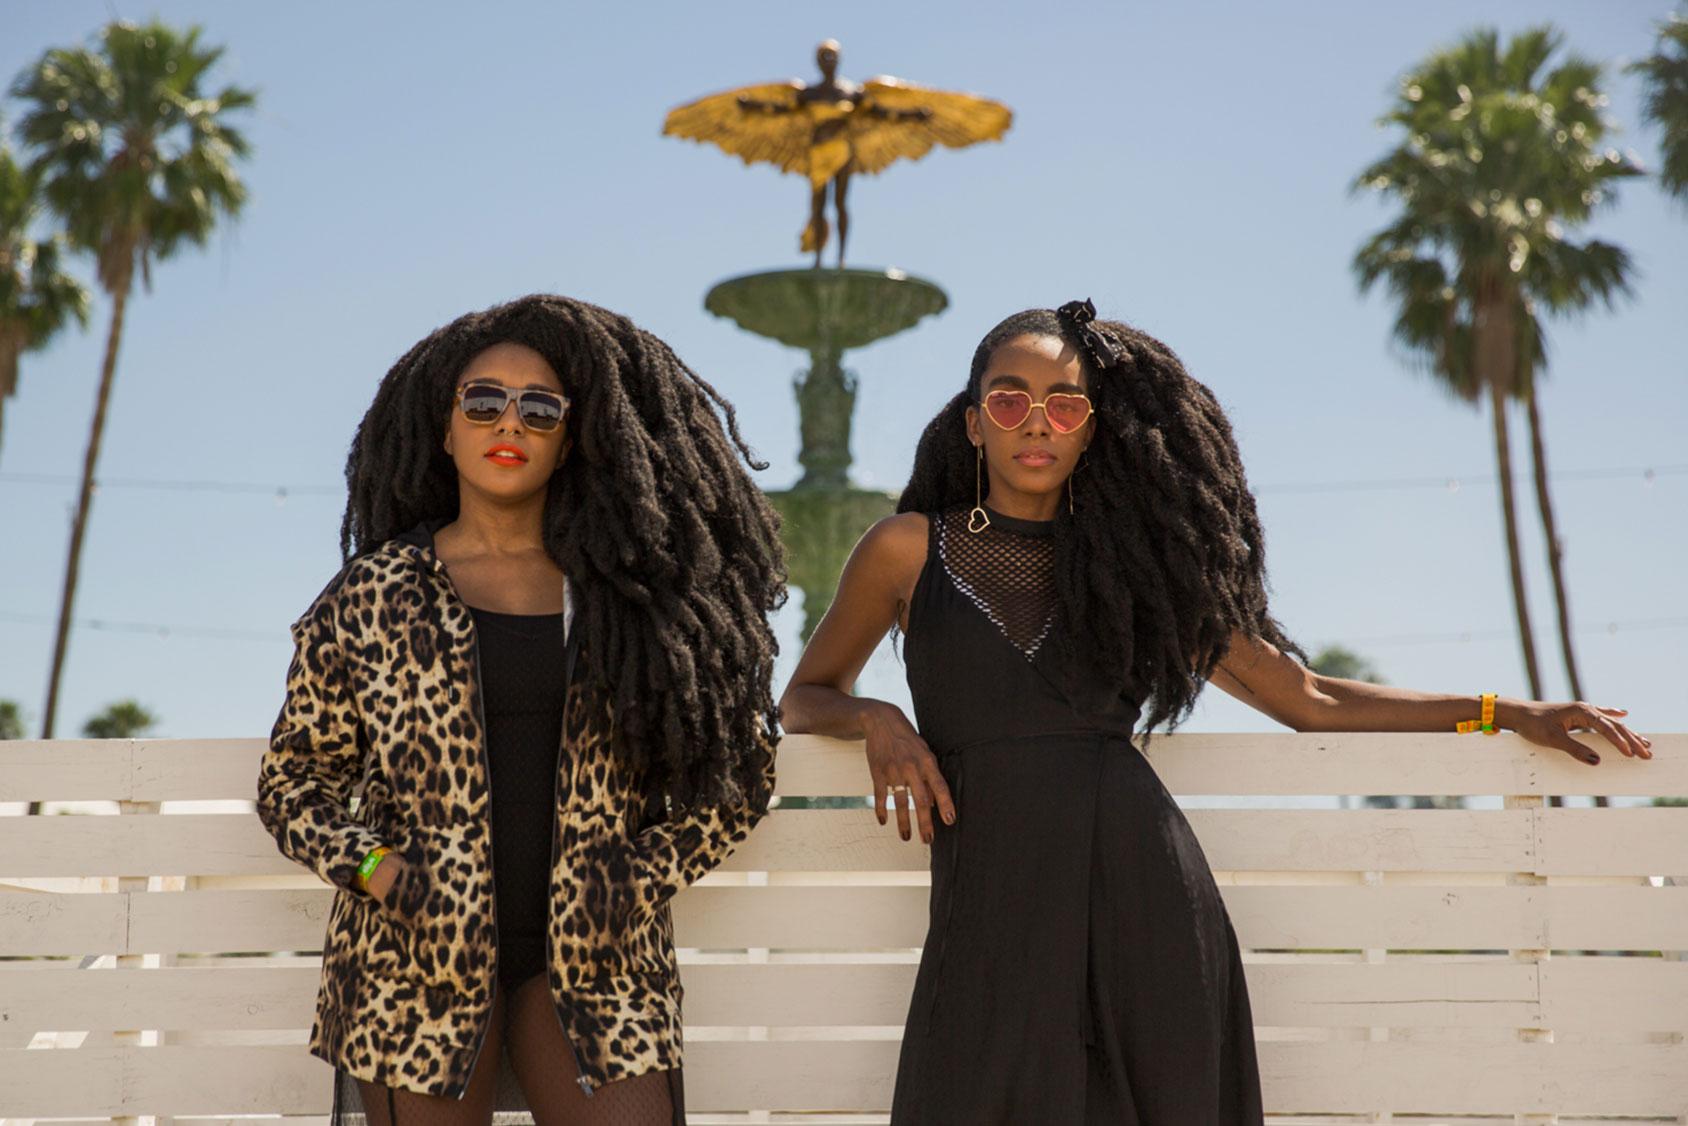 TK(左)身着一件豹纹连帽衫与黑色网眼连衣裙。 Cipriana(右)在网眼上衣外穿着一件黑色丝缎裙。 她们身上的服装与配饰均来自于H&M的春夏季系列。